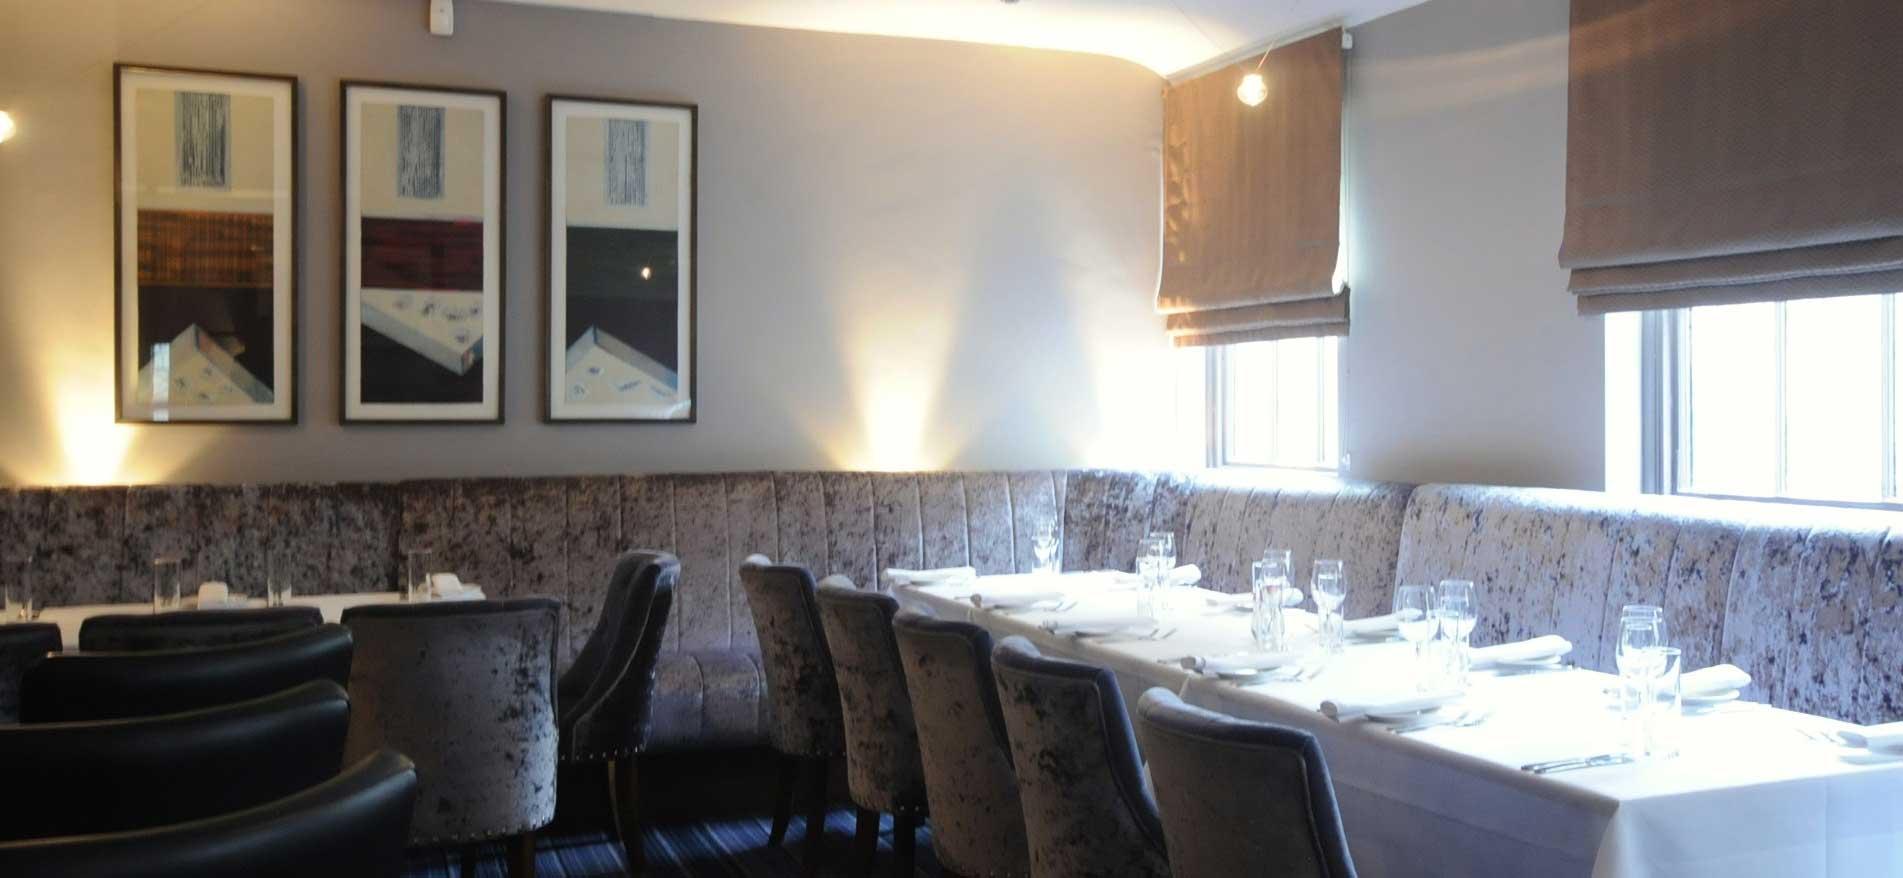 Restaurant Painting & Decorating